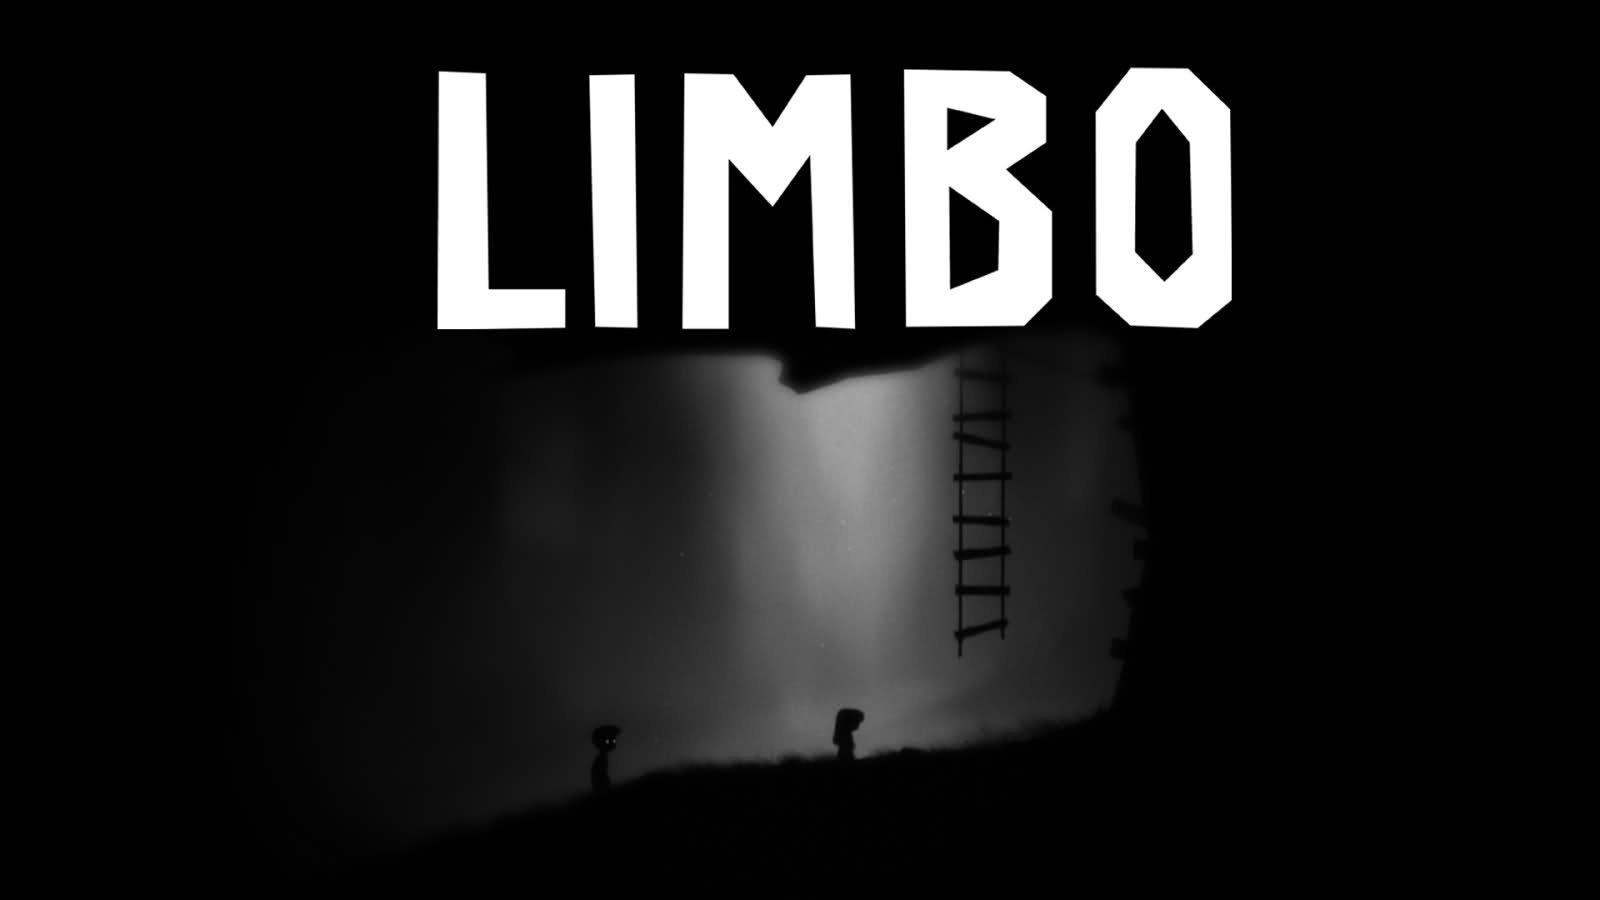 LIMBO-I-whipped-up-1920X1080-wallpaper-wp3401662